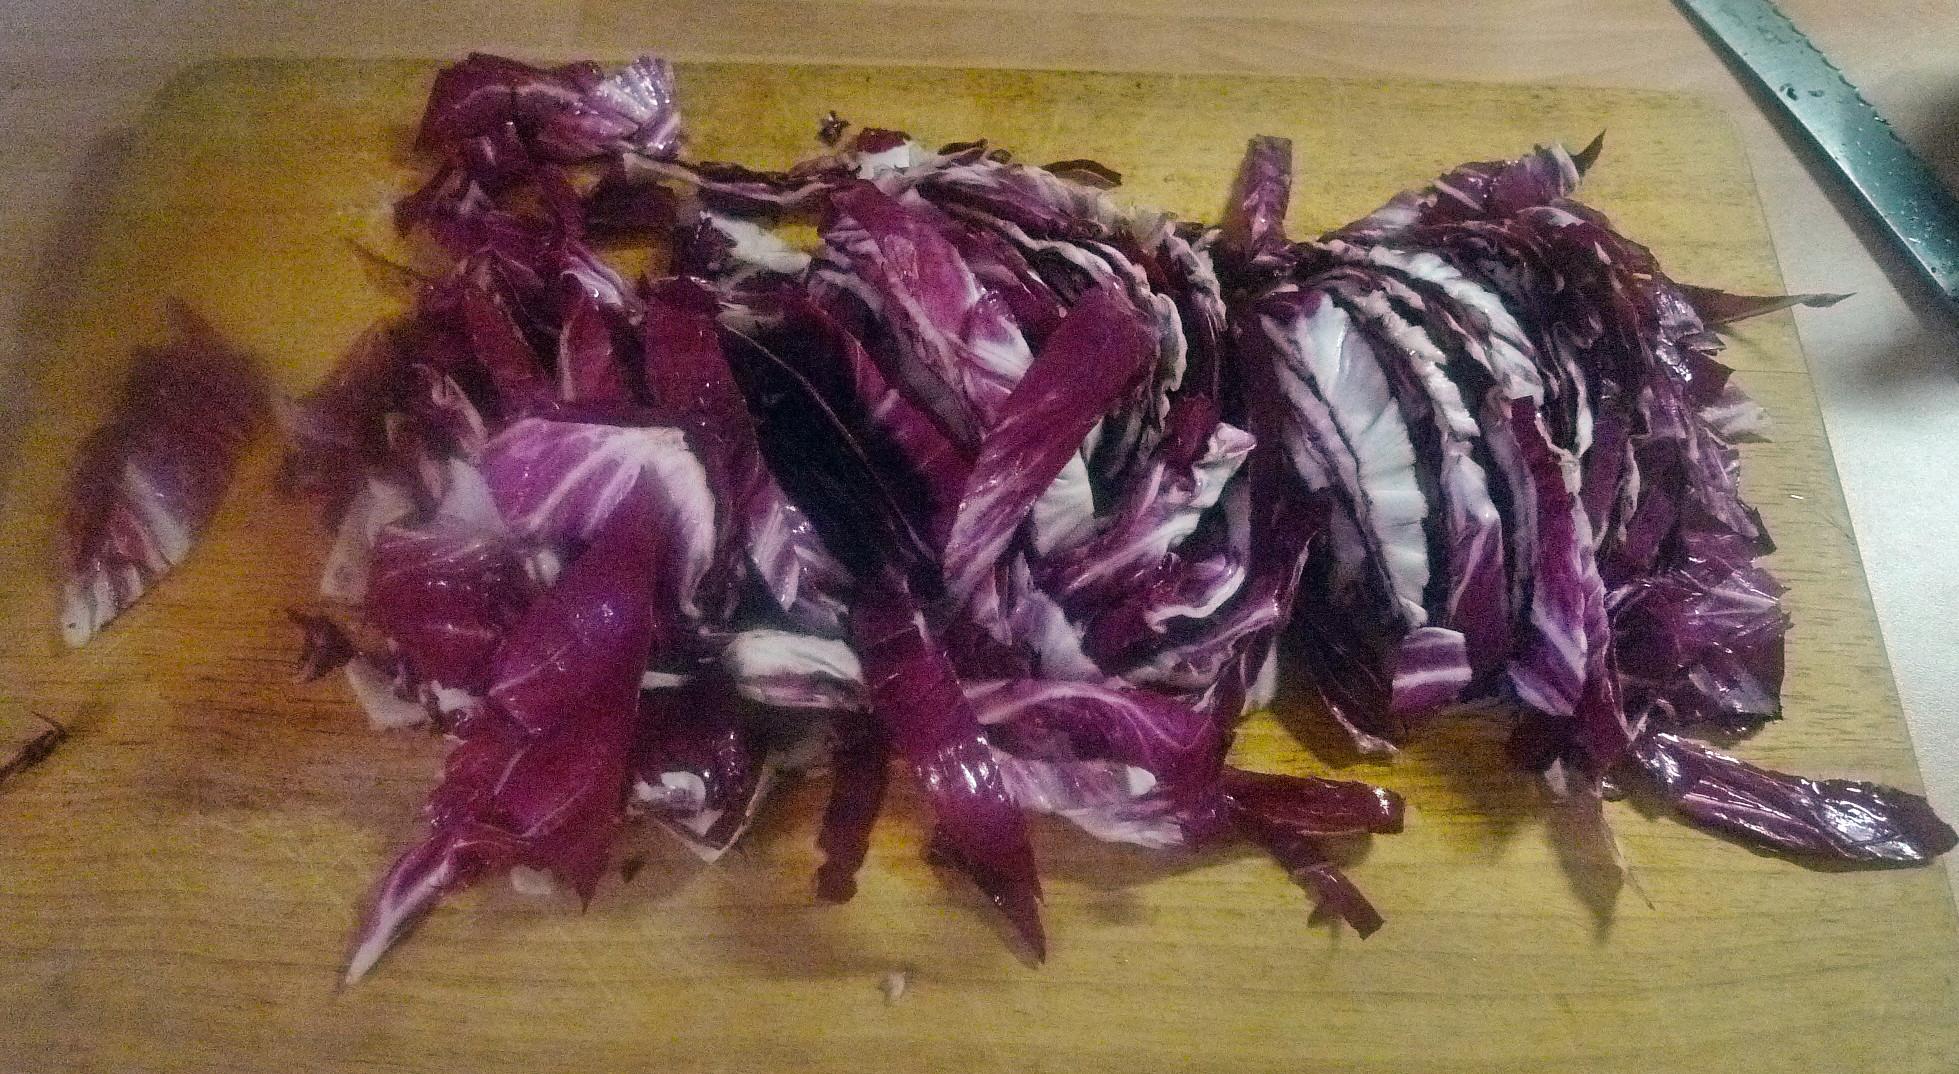 Kartoffel,Rührei,Salate,Humus -17.10.14   (1a)